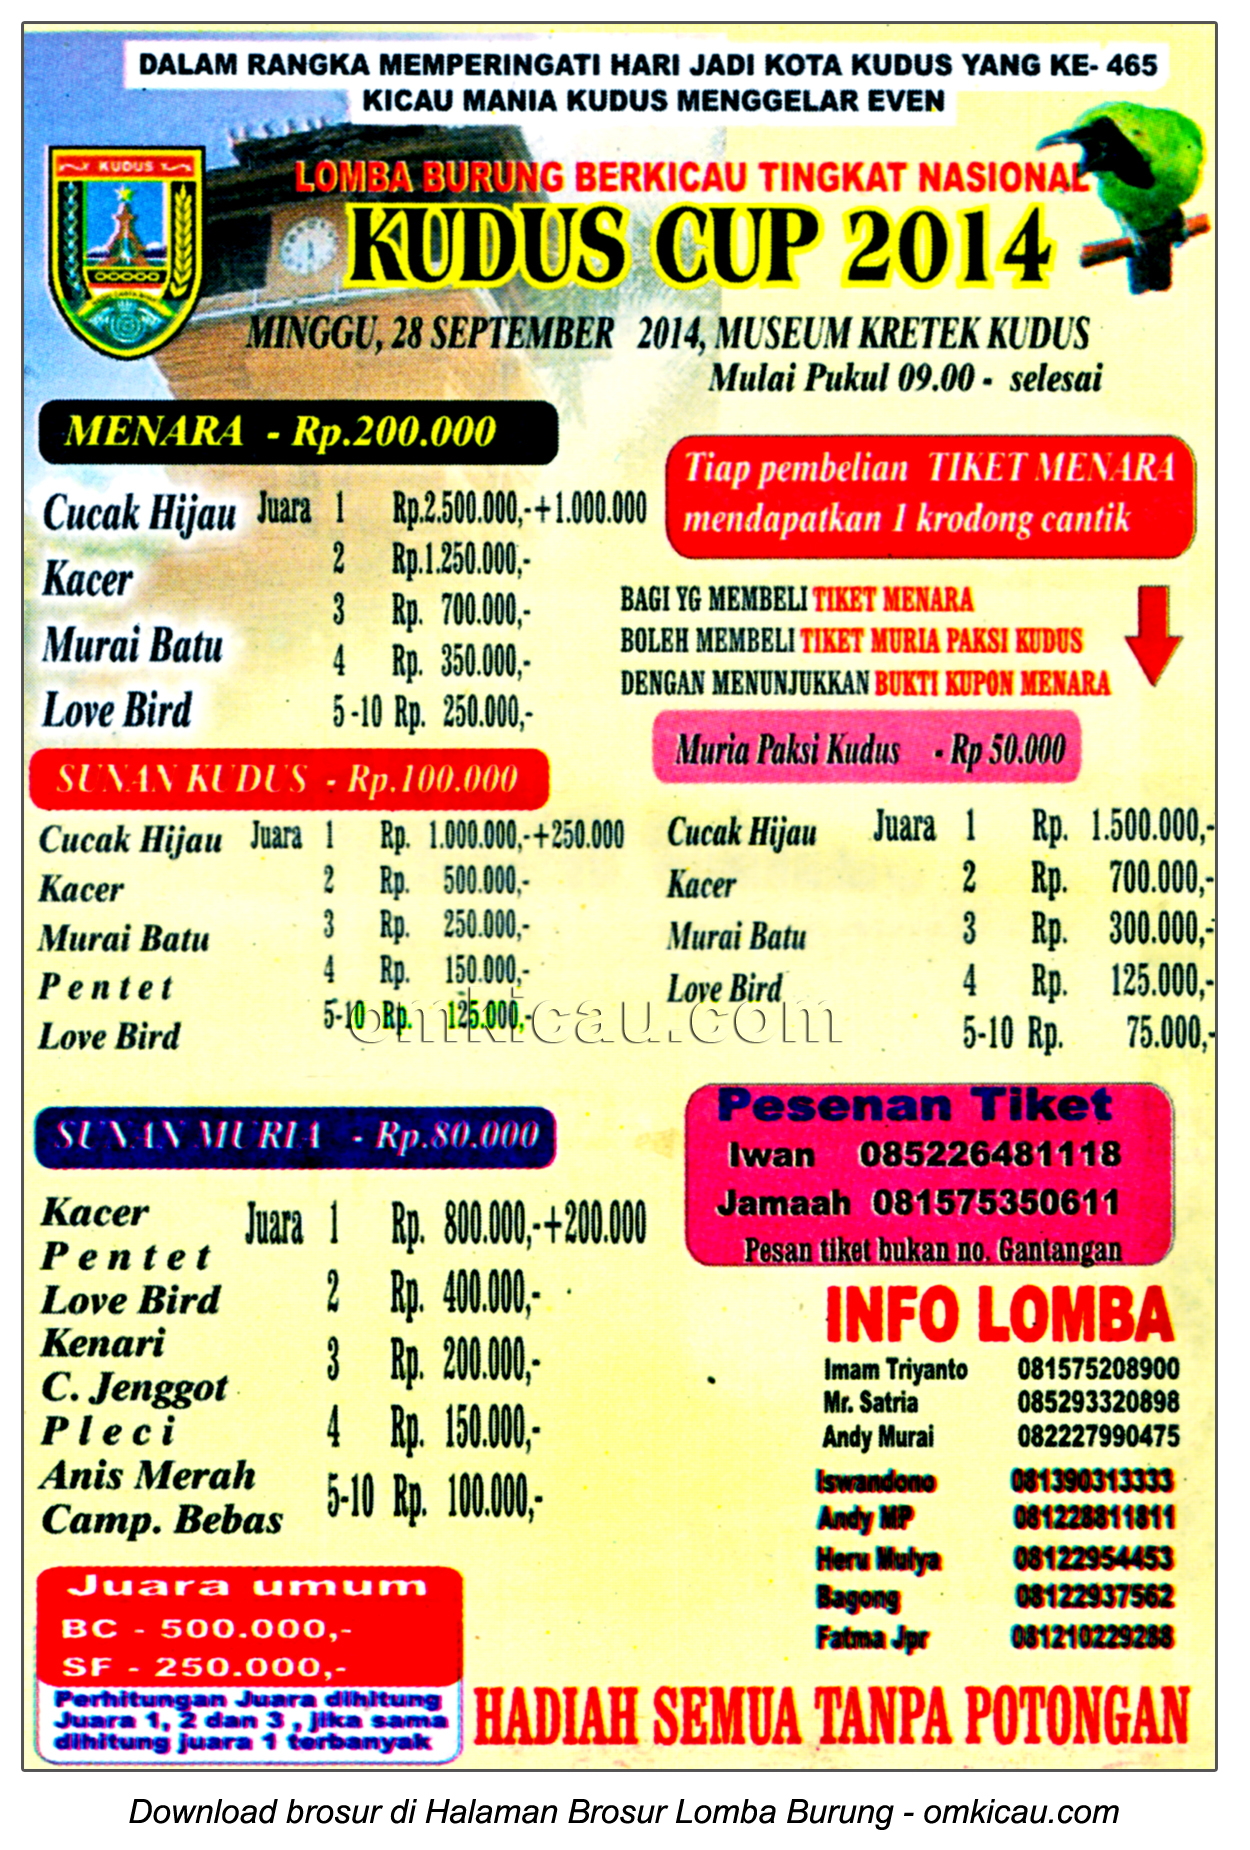 Brosur Lomba Burung Berkicau Kudus Cup 2014, Kudus, 28 September 2014